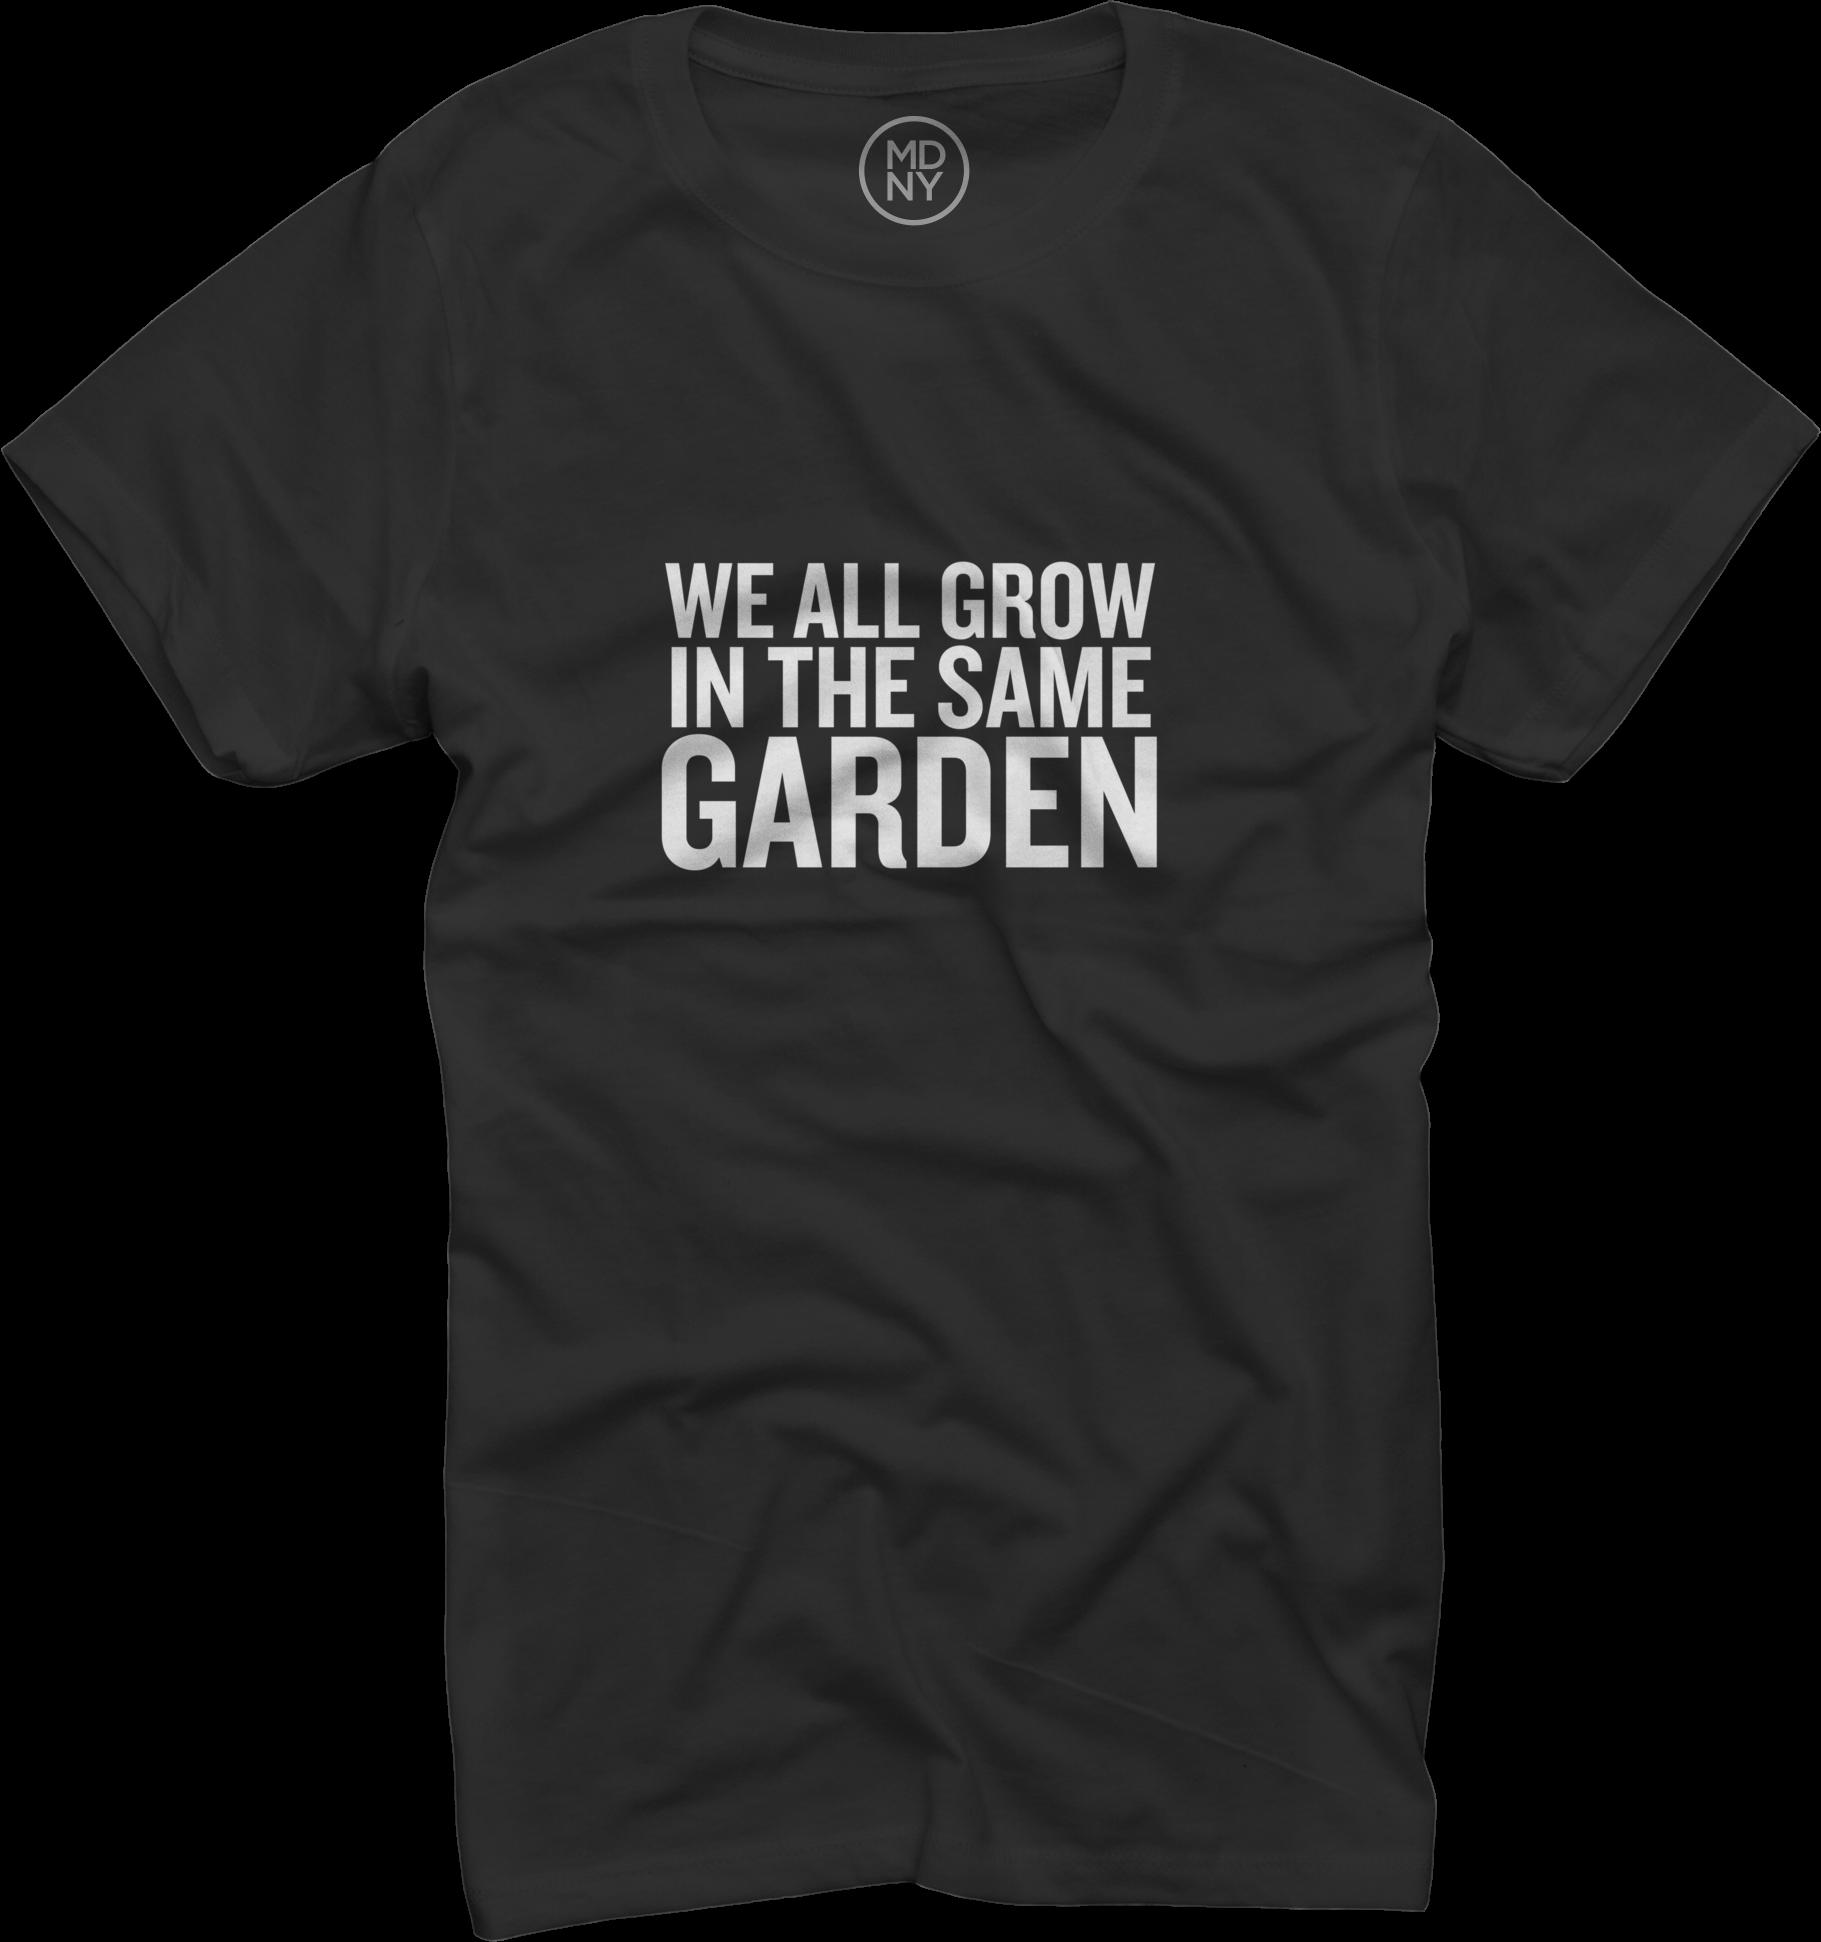 Christian Siriano - We All Grow (black)